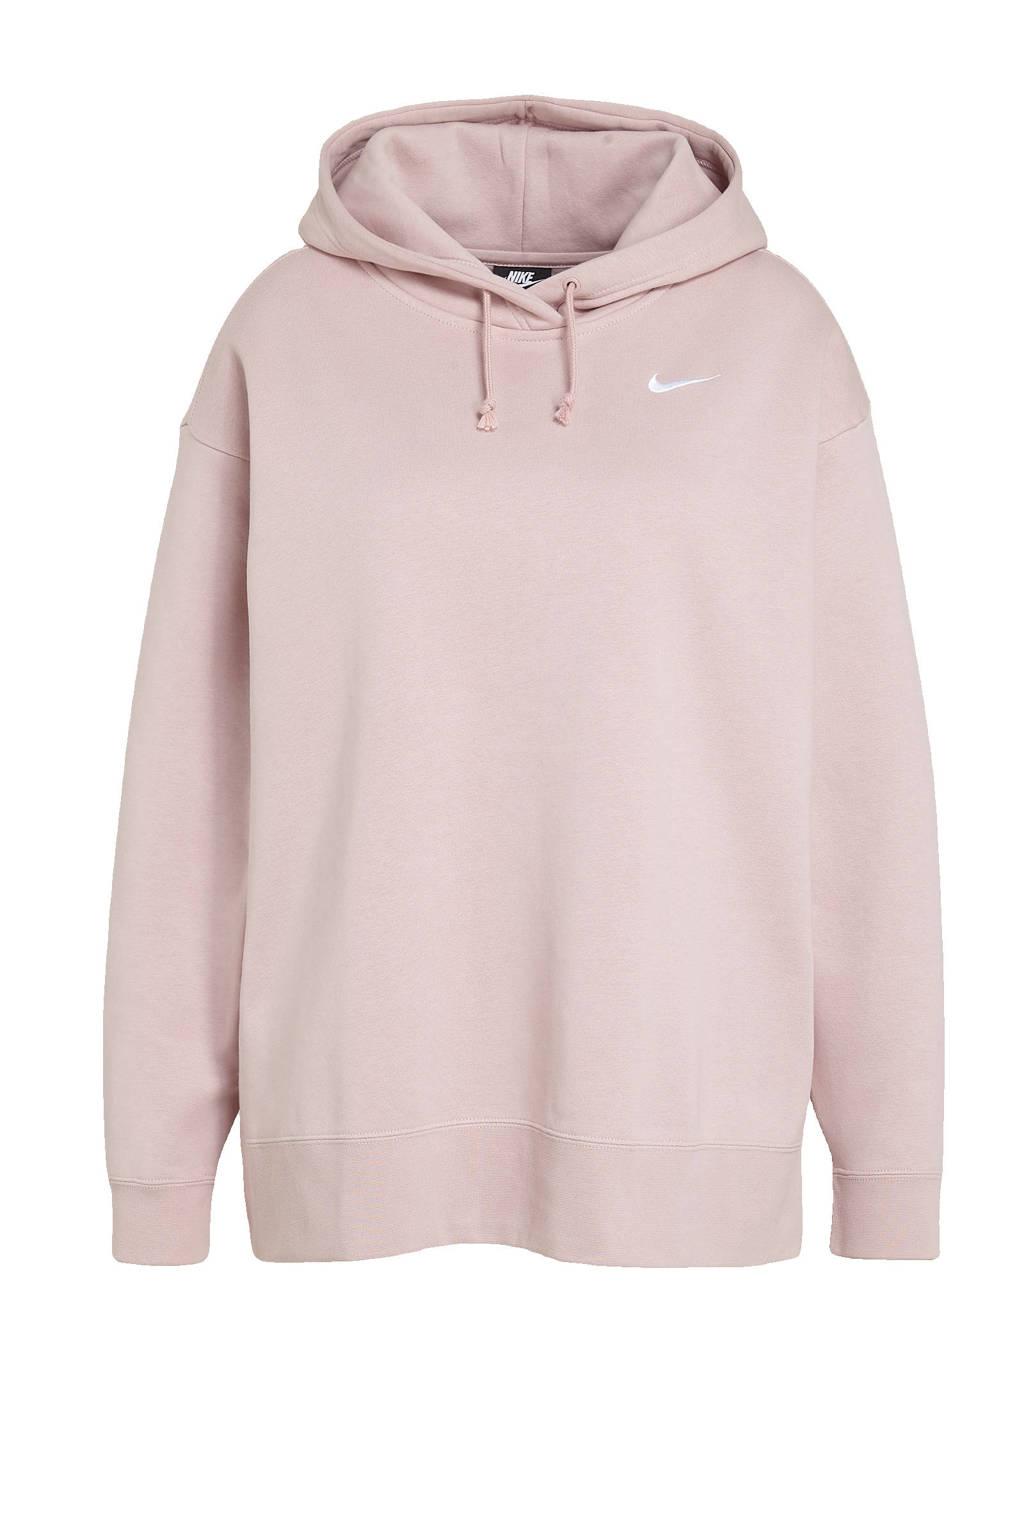 Nike Plus Size hoodie licht roze, Licht roze